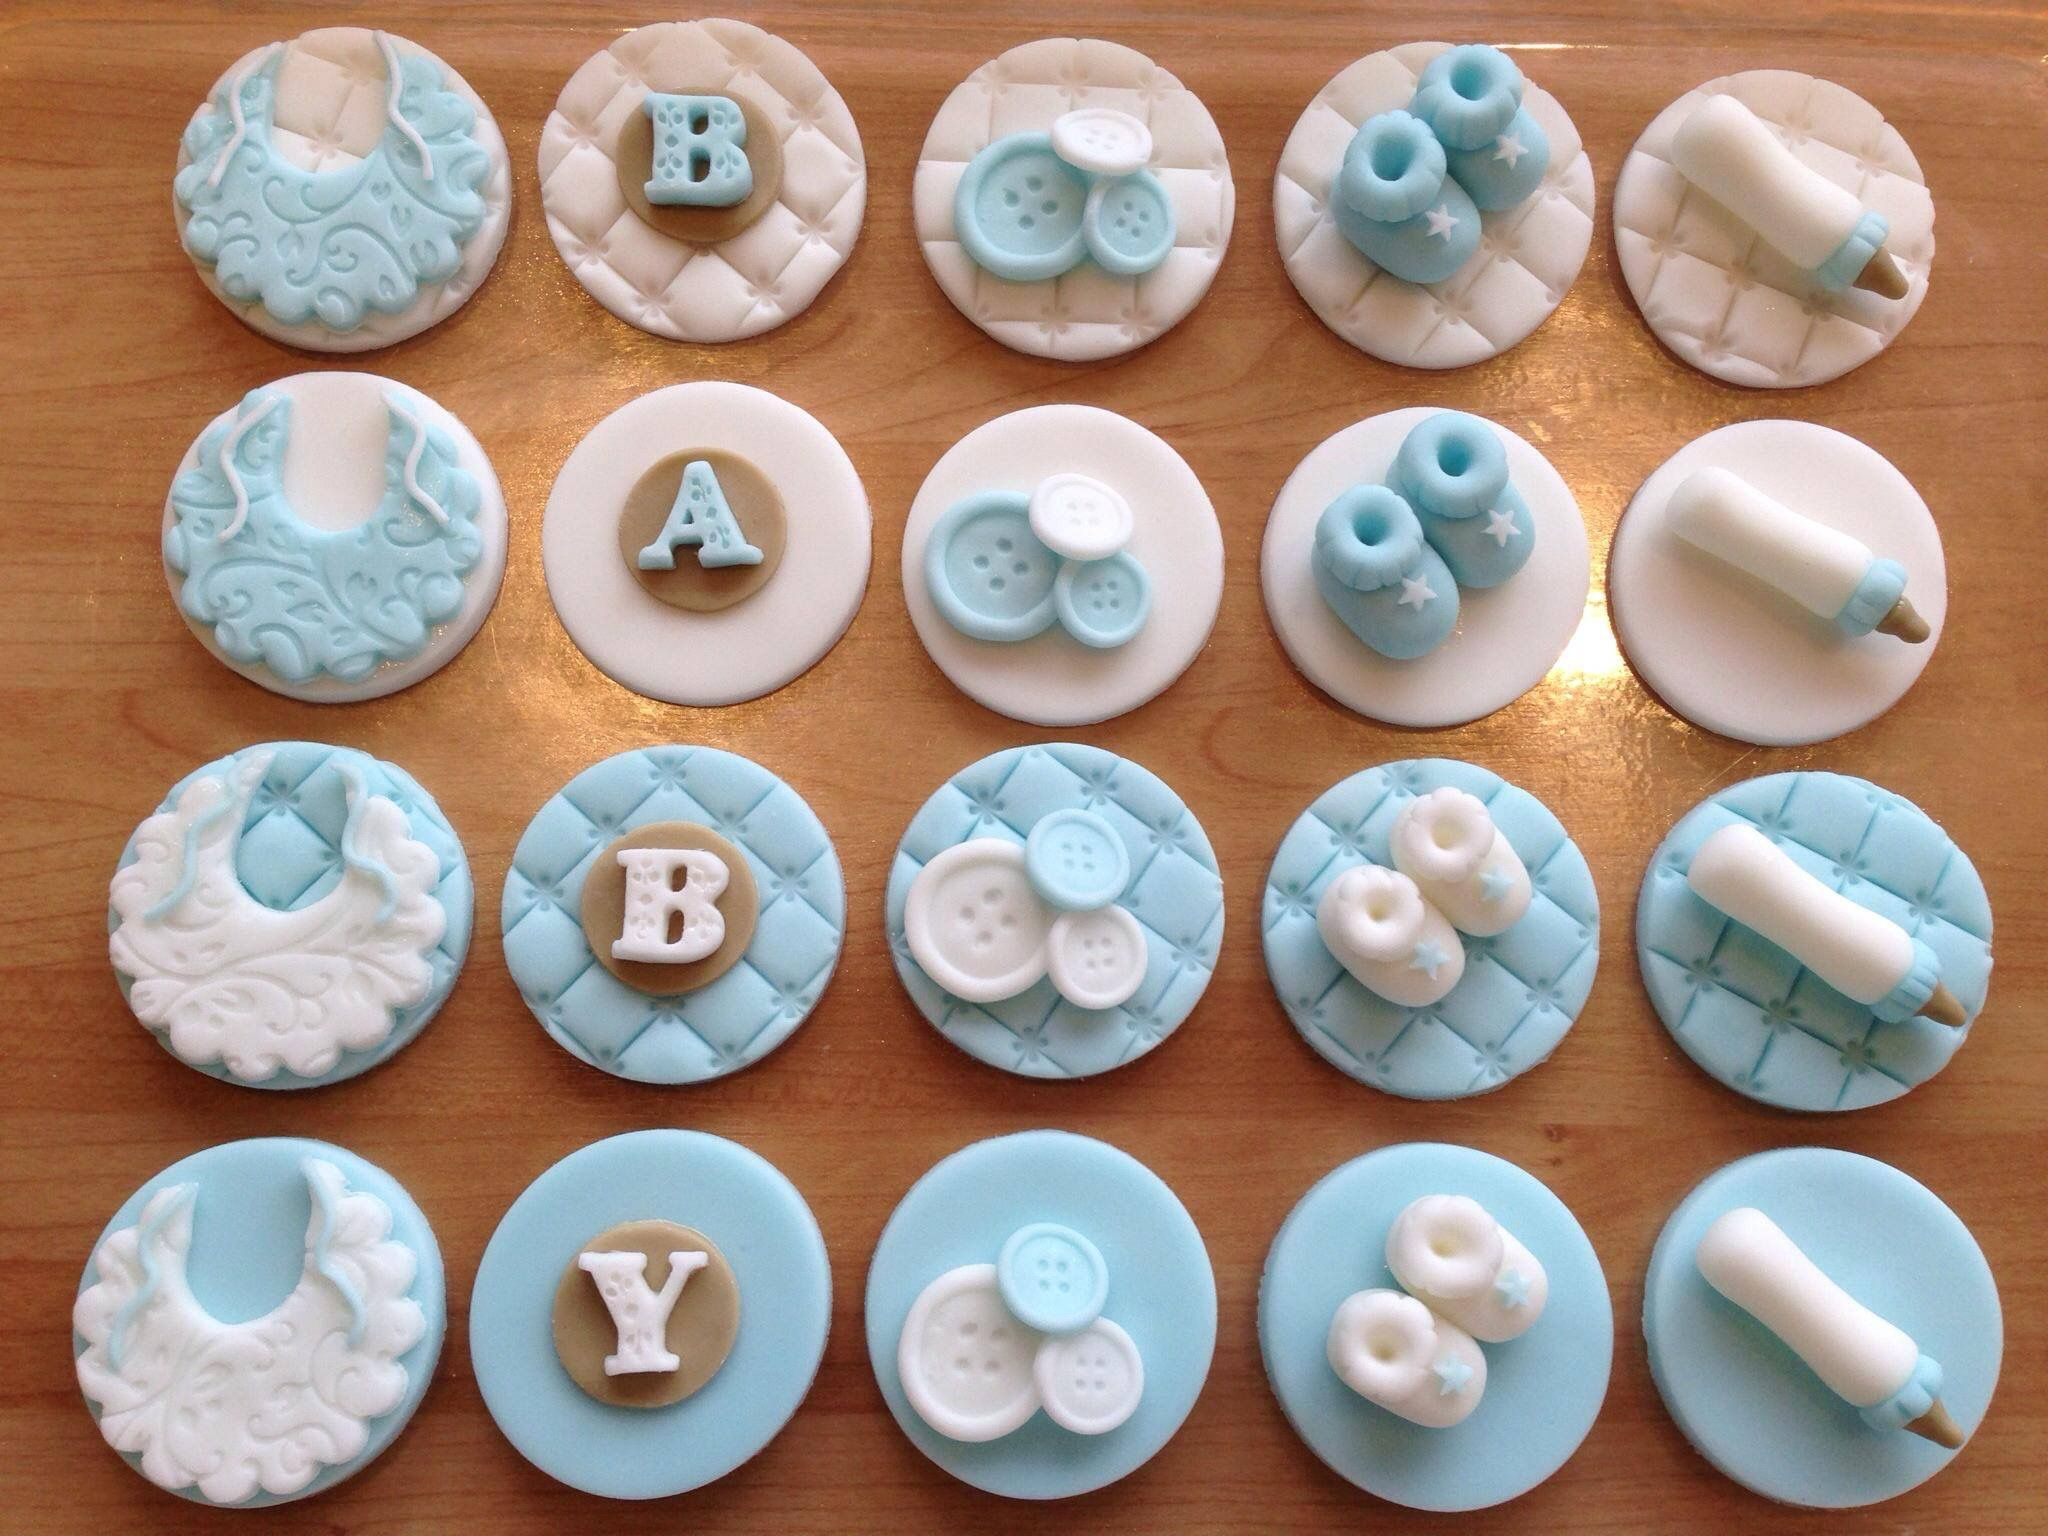 Medium Of Baby Shower Cupcake Ideas